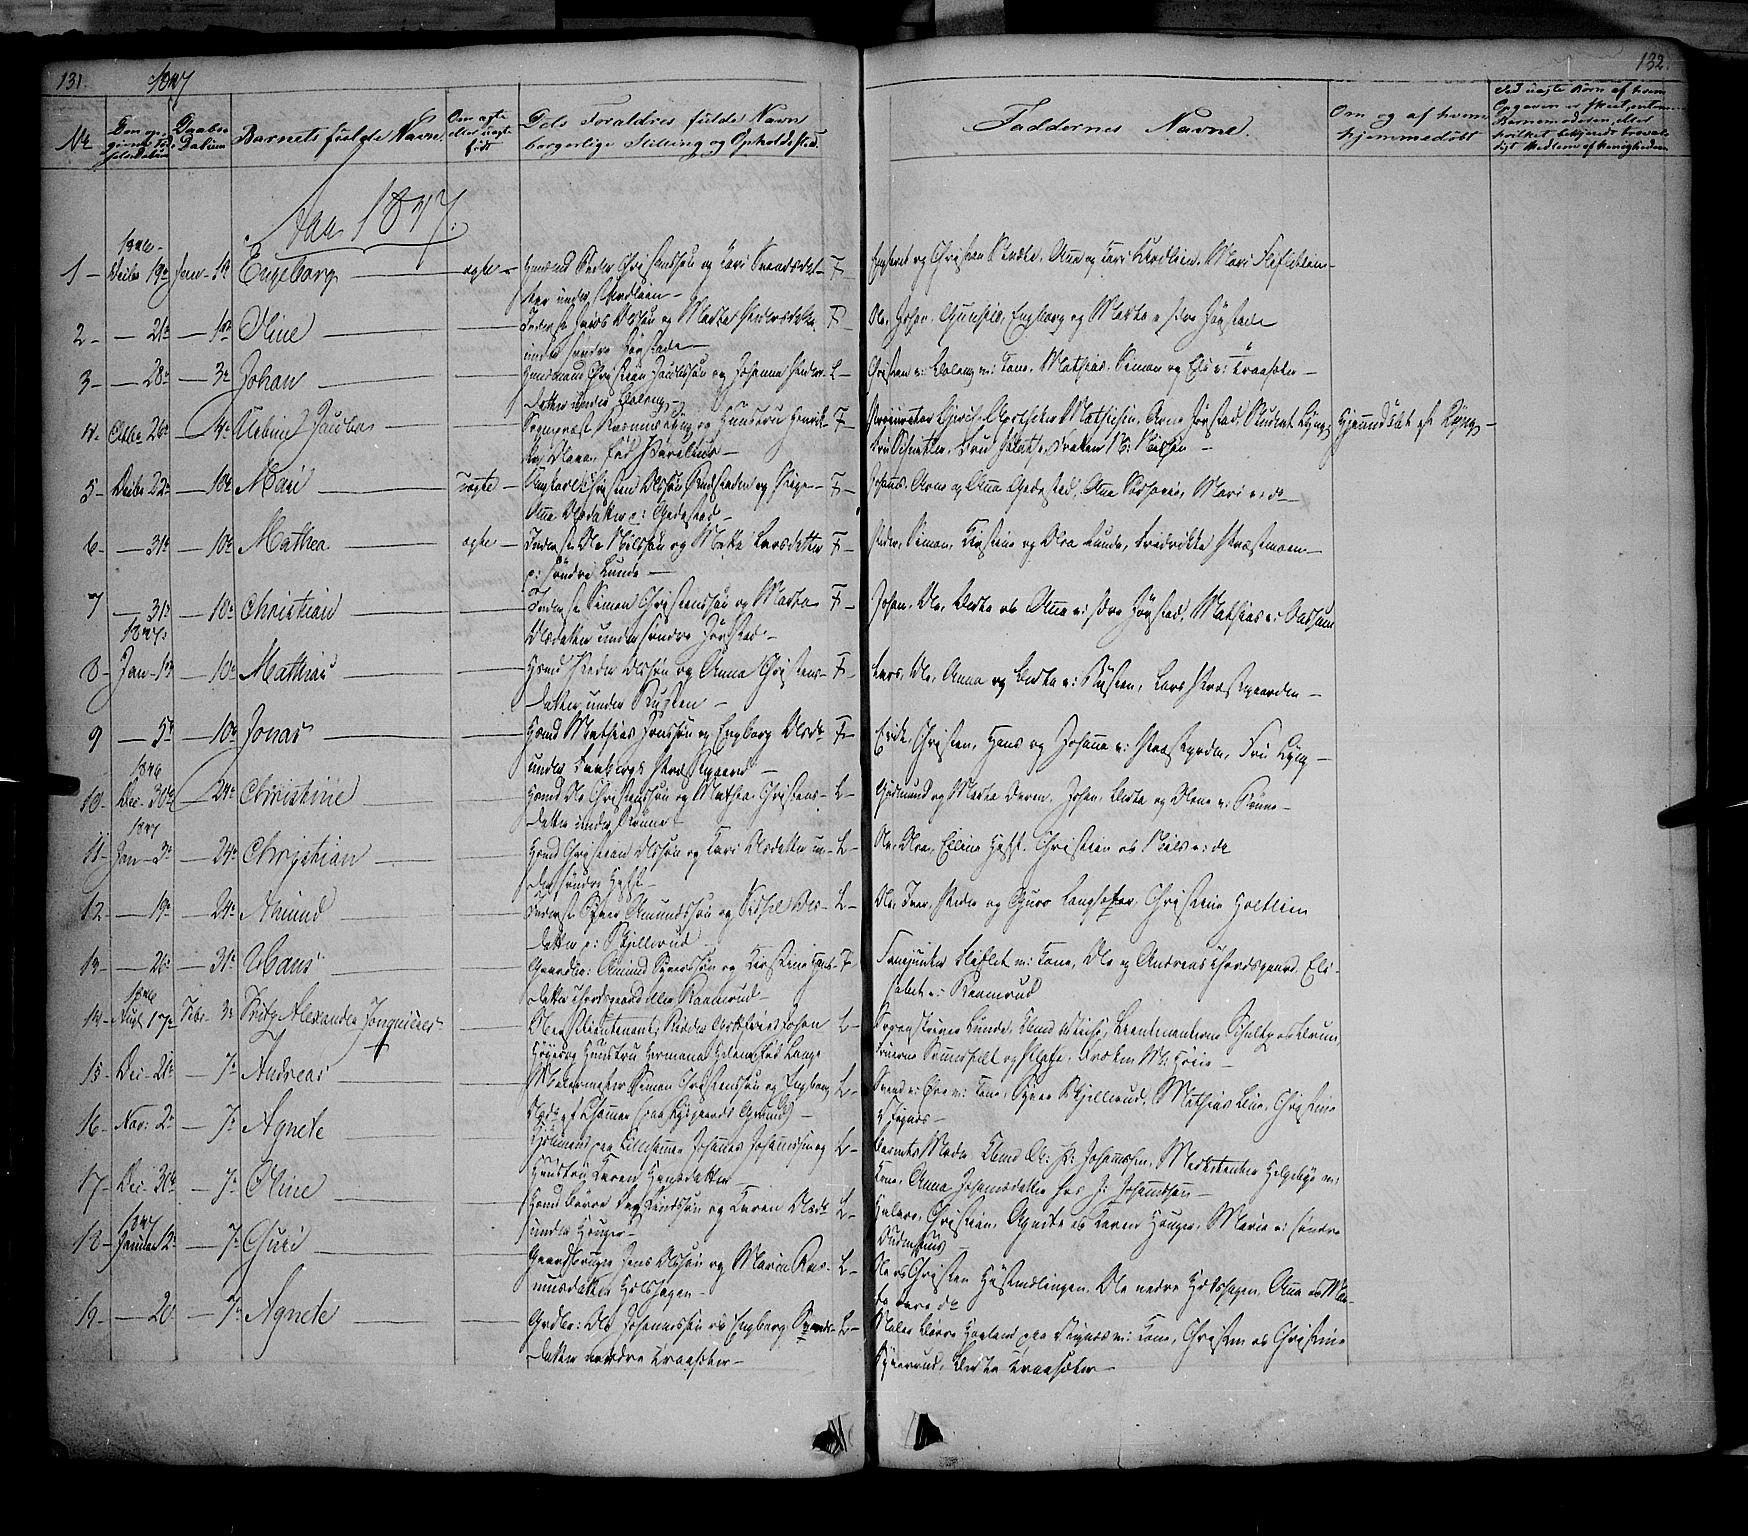 SAH, Fåberg prestekontor, Ministerialbok nr. 5, 1836-1854, s. 131-132